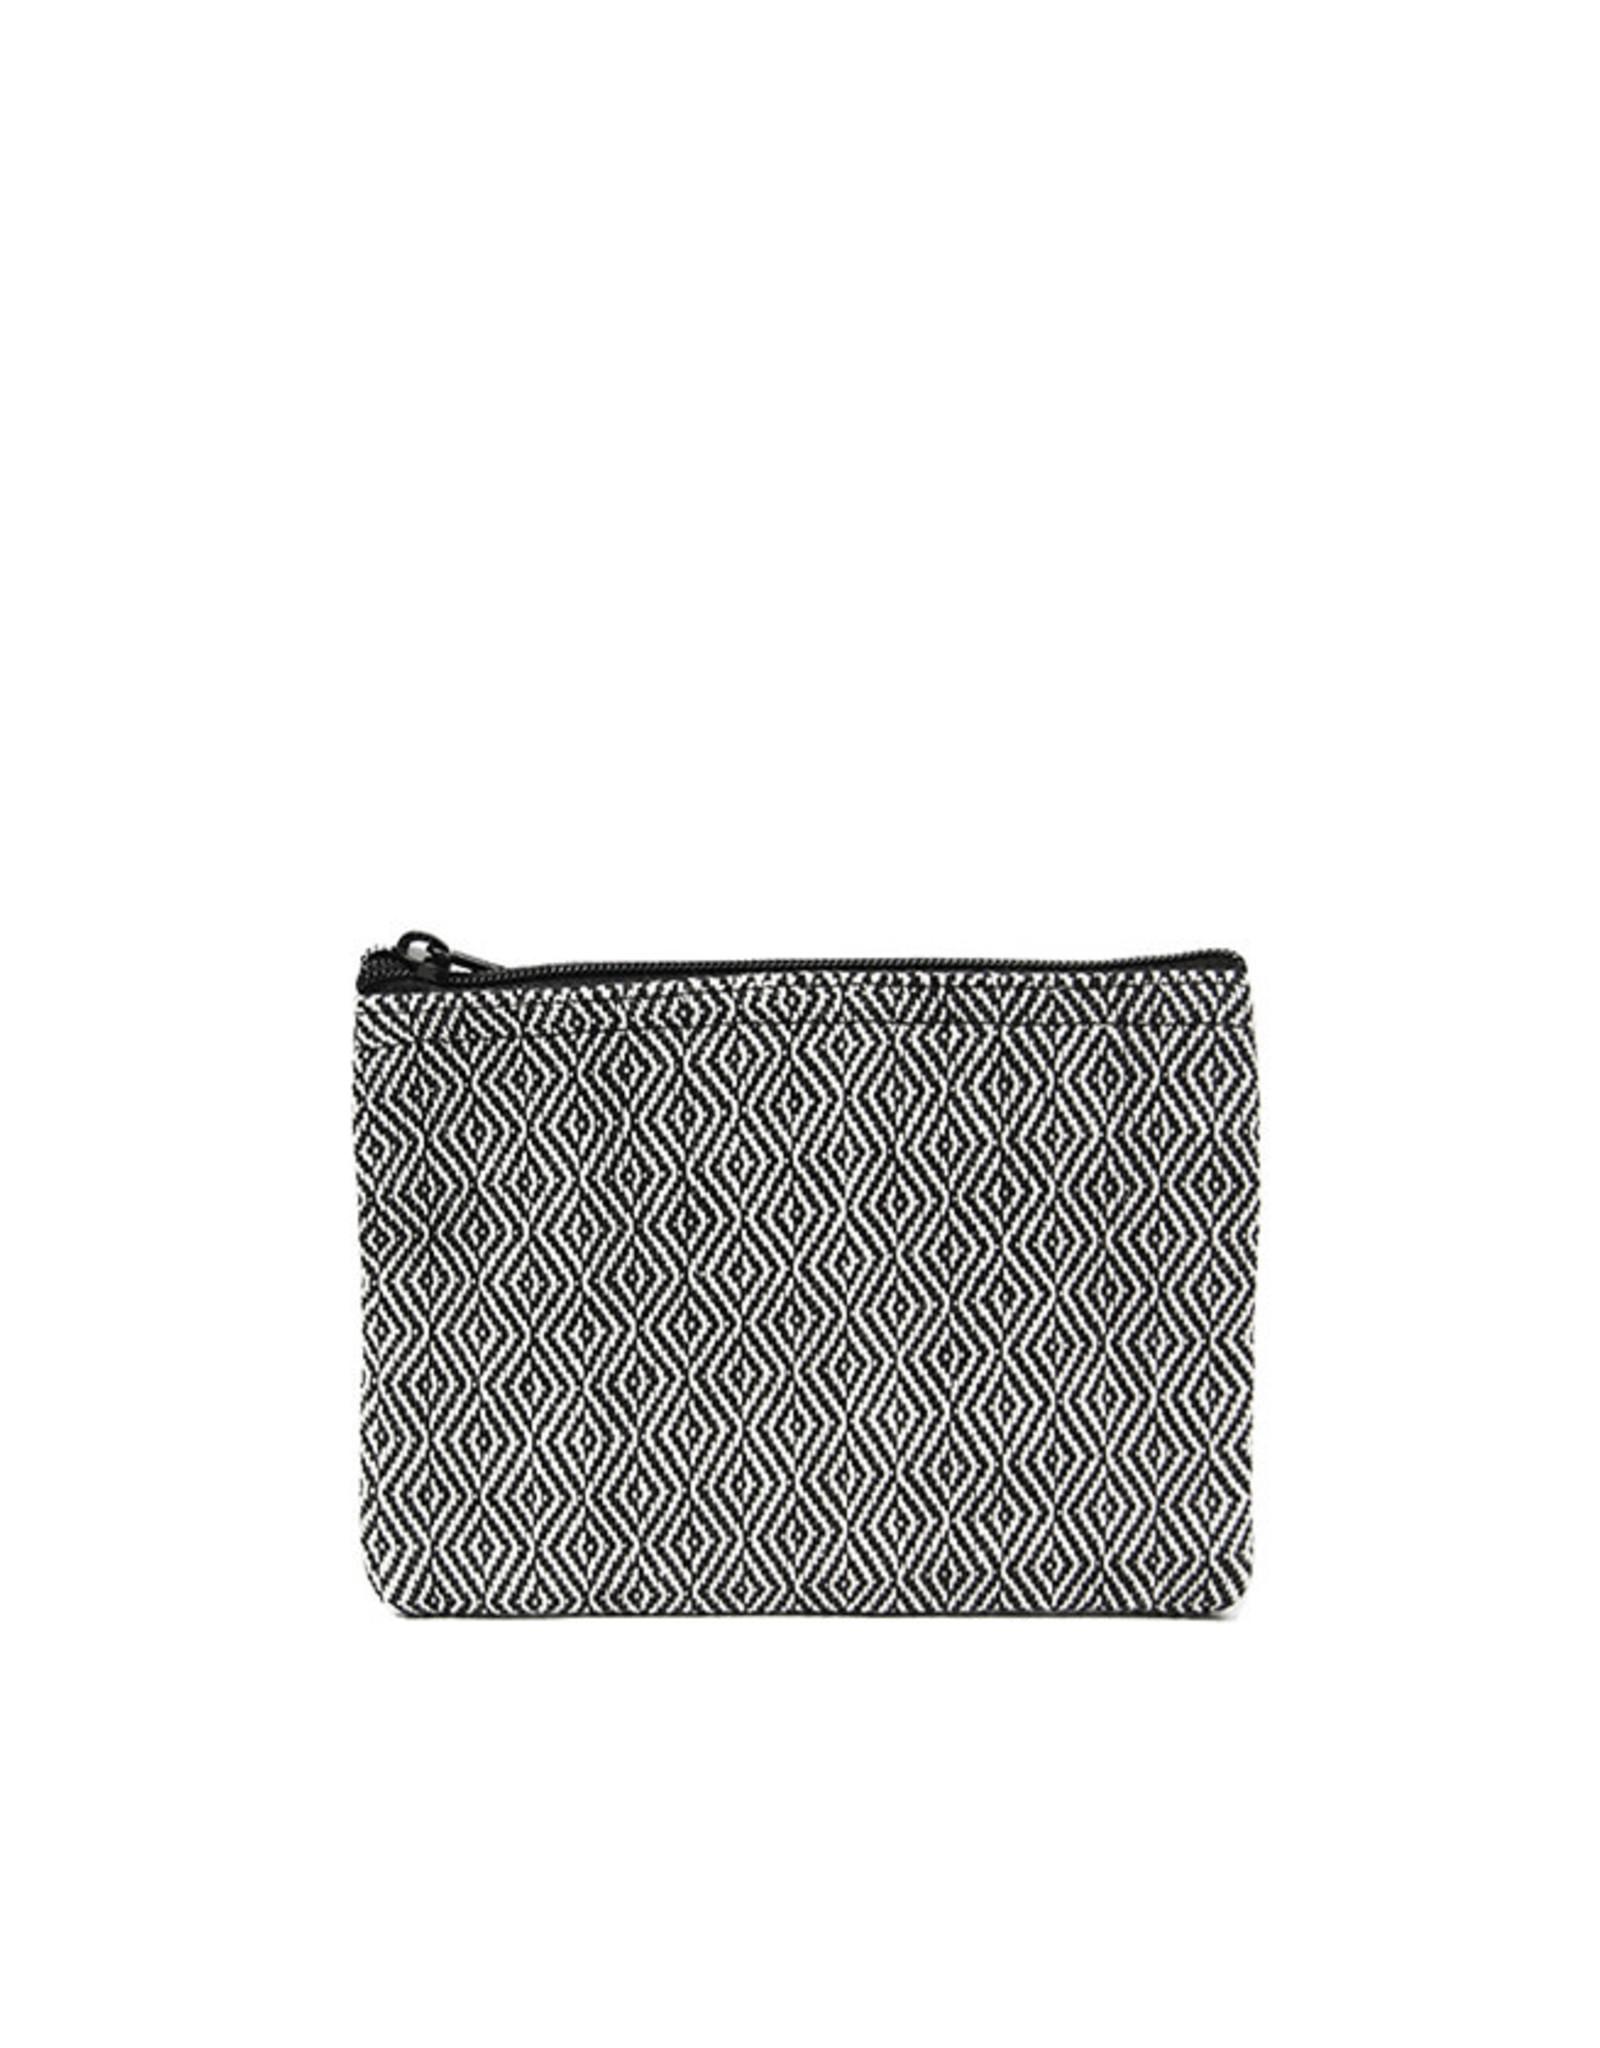 Anna Nera Wallet Facet S 15x12cm-black&white